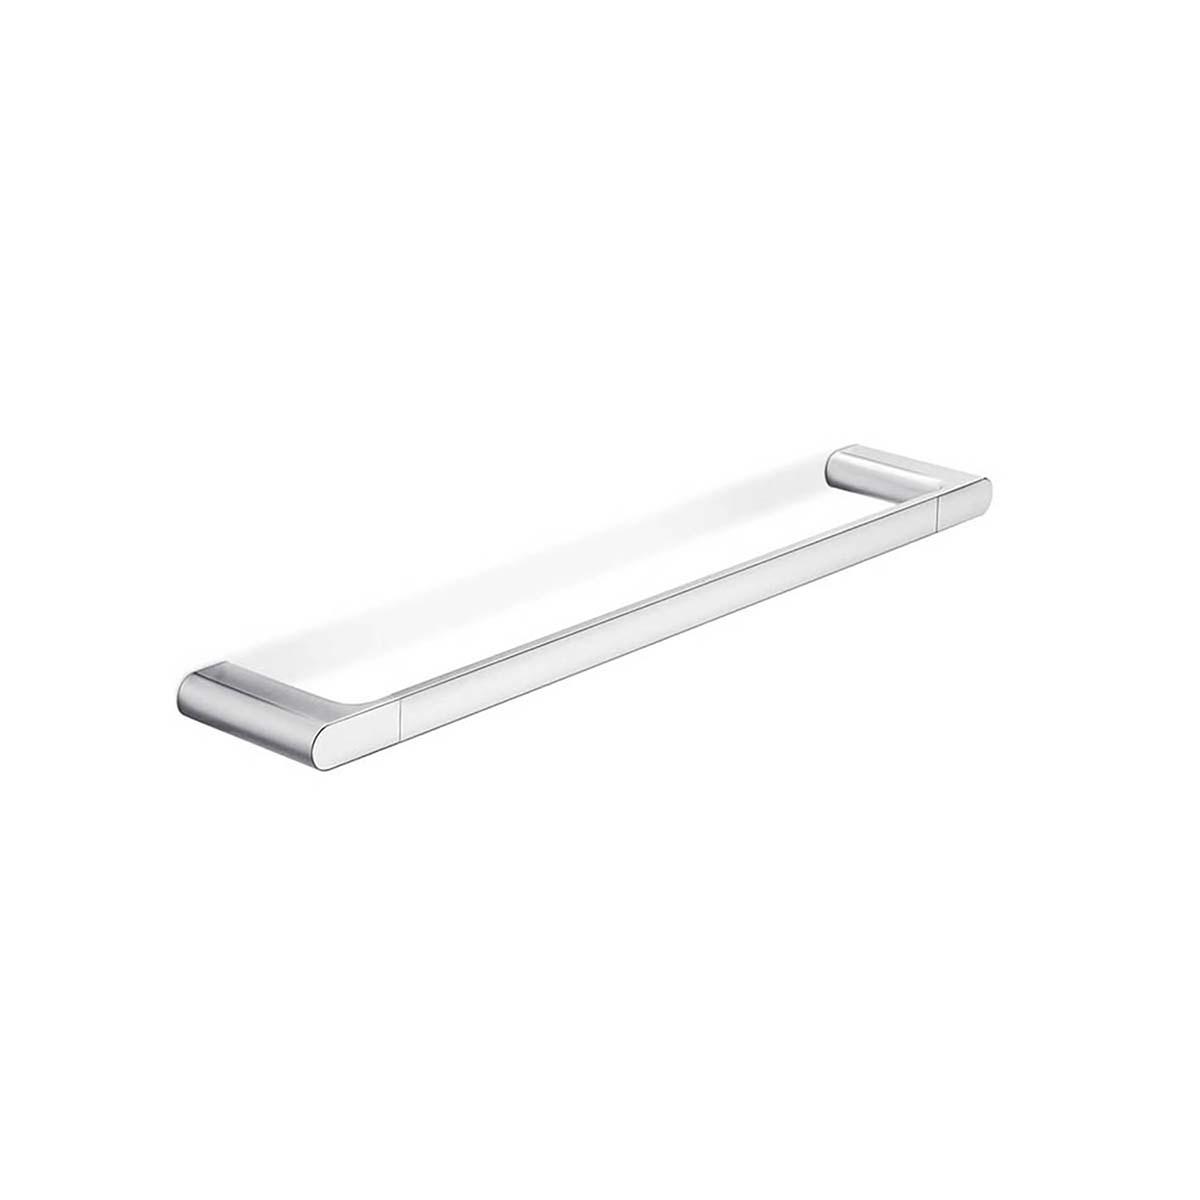 Mito Towel Bar Mito A2018a A2018b A2018c A2018d Modo Bath